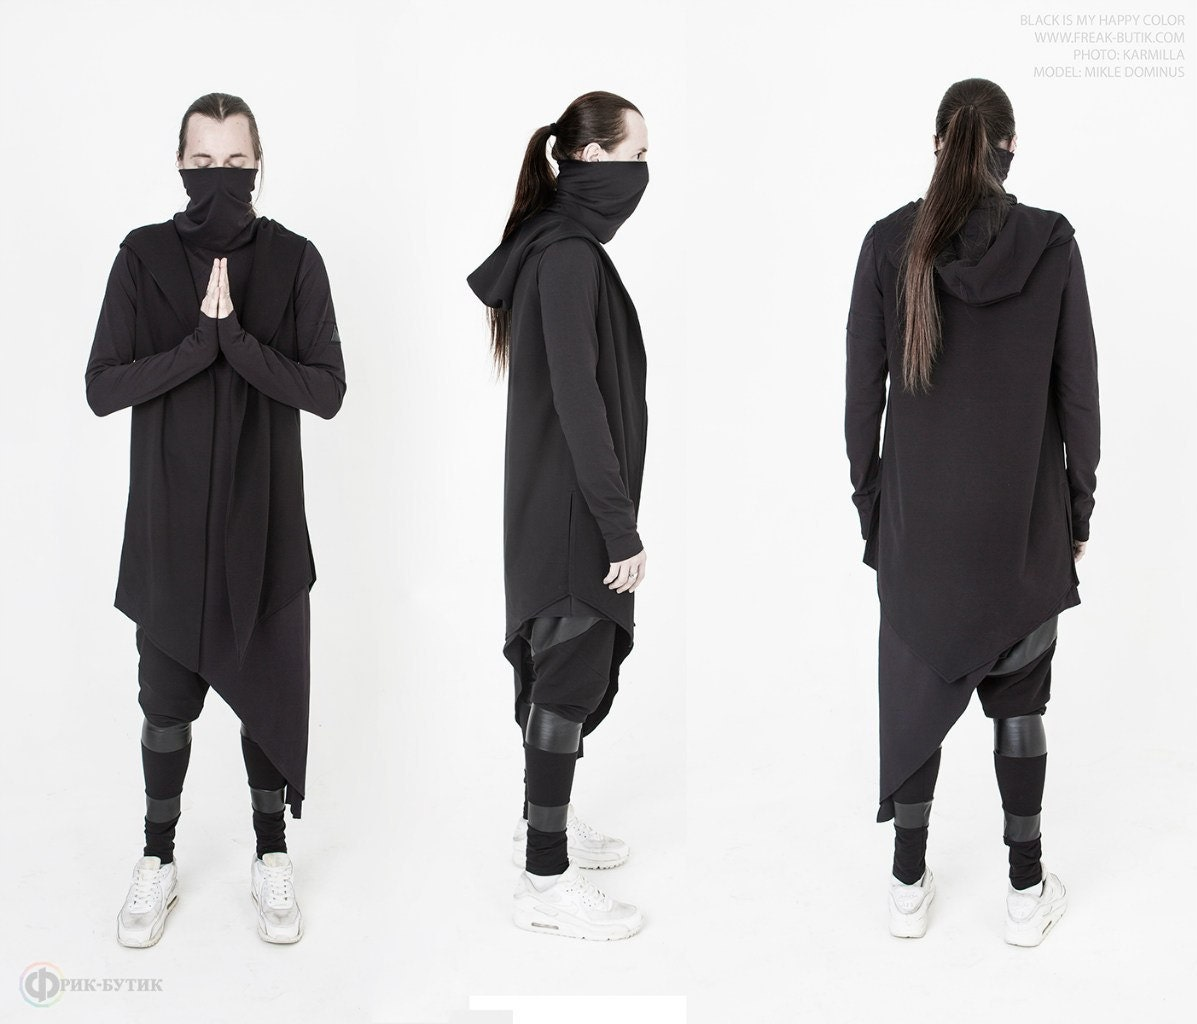 Tunic Ghetto ninja long Туника Ghetto ninja | Etsy